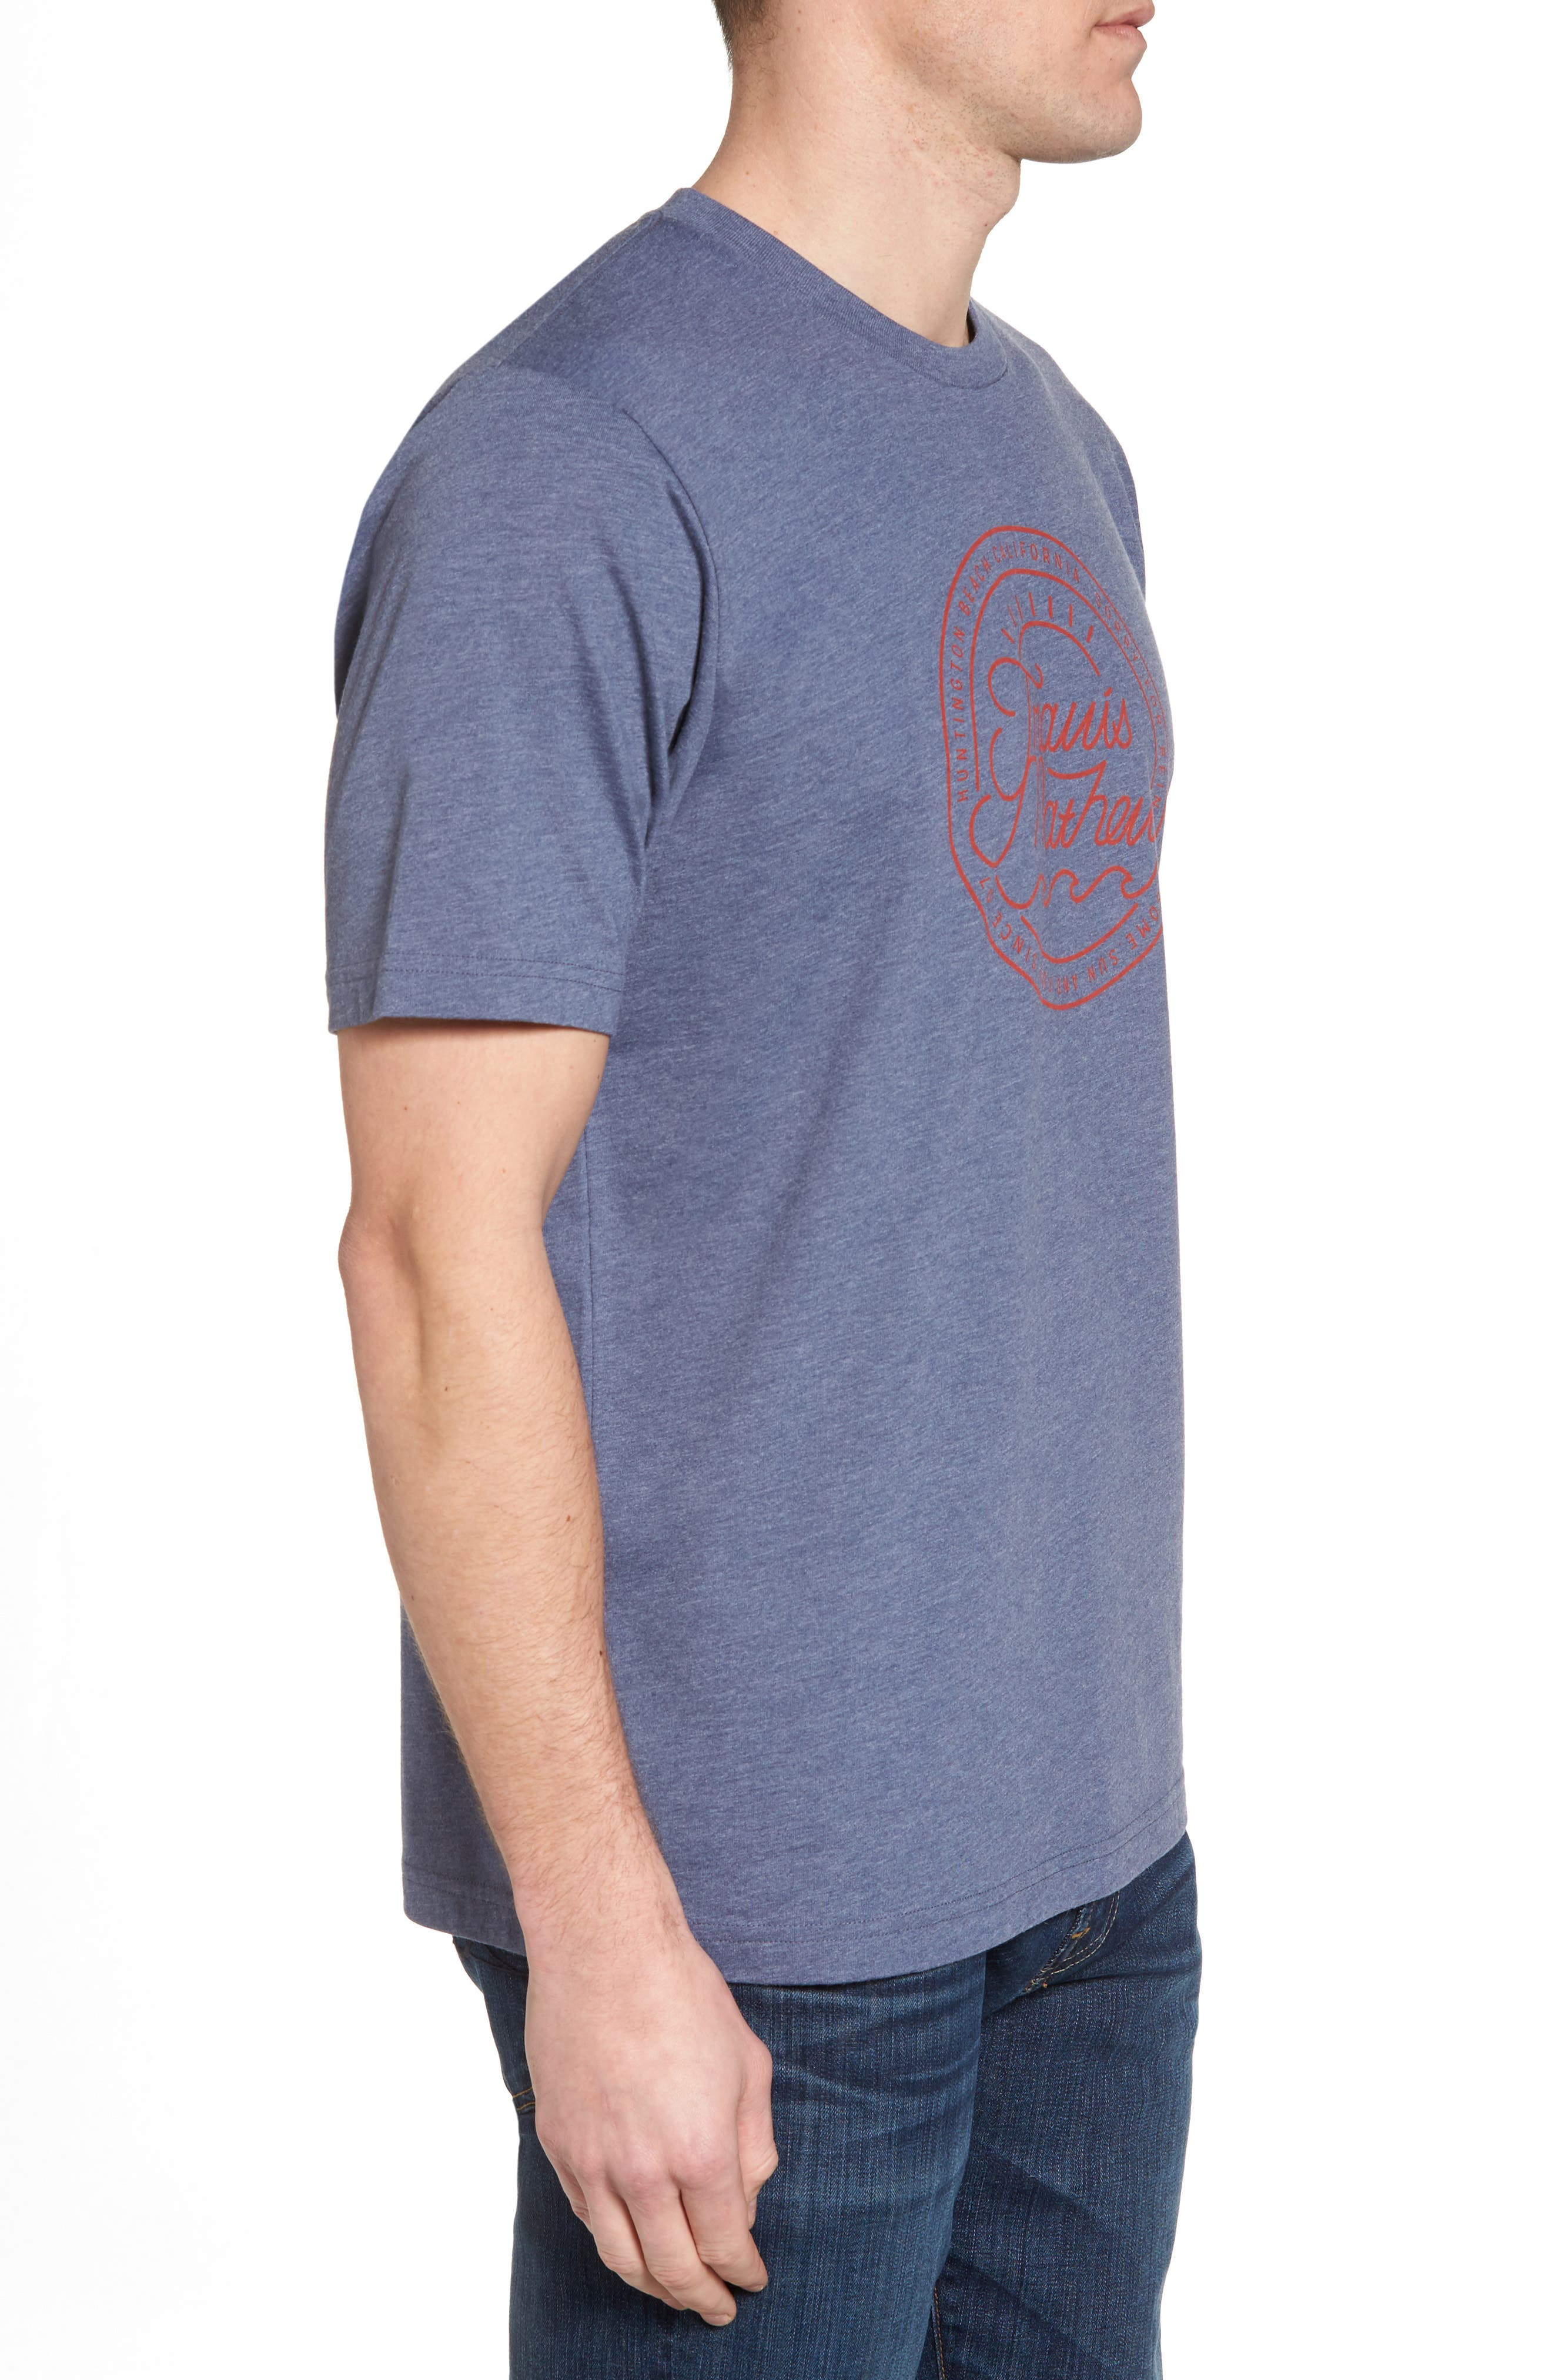 Drebo Graphic T-Shirt,                             Alternate thumbnail 3, color,                             Heather Blue Nights